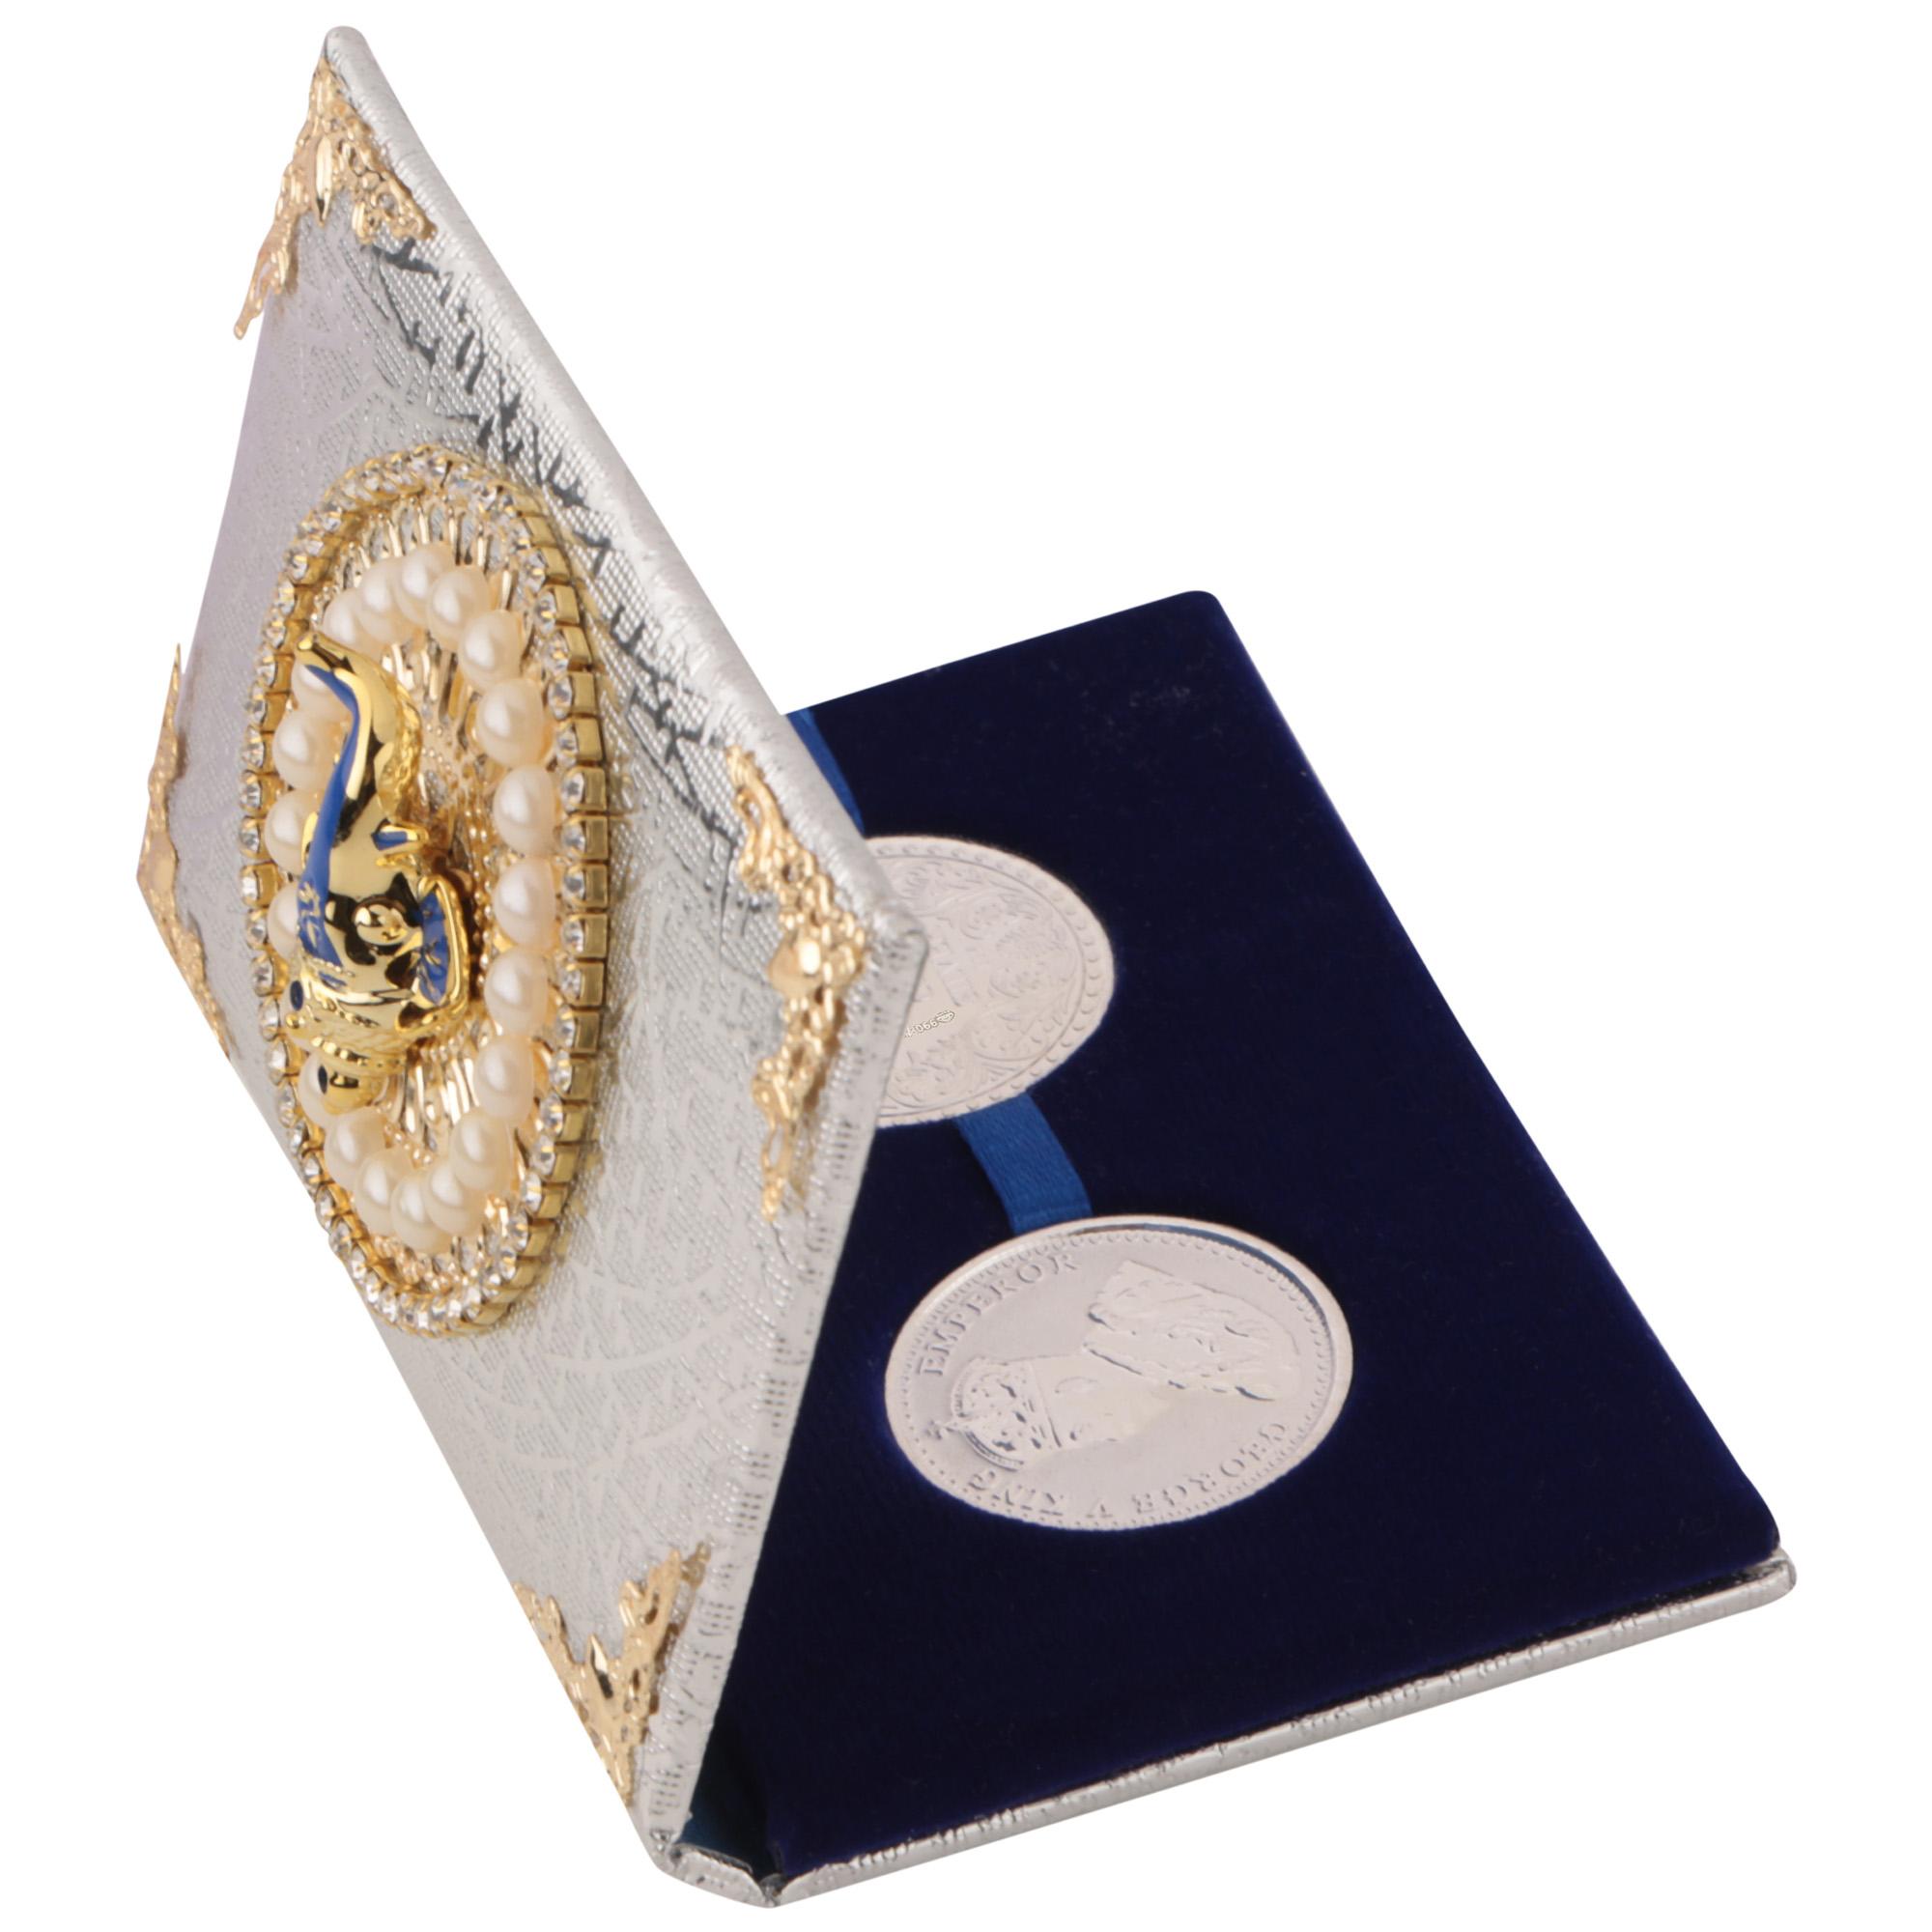 Silver Coin 10gm x2 in Ganesh ji Moti Packing by Osasbazaar Open